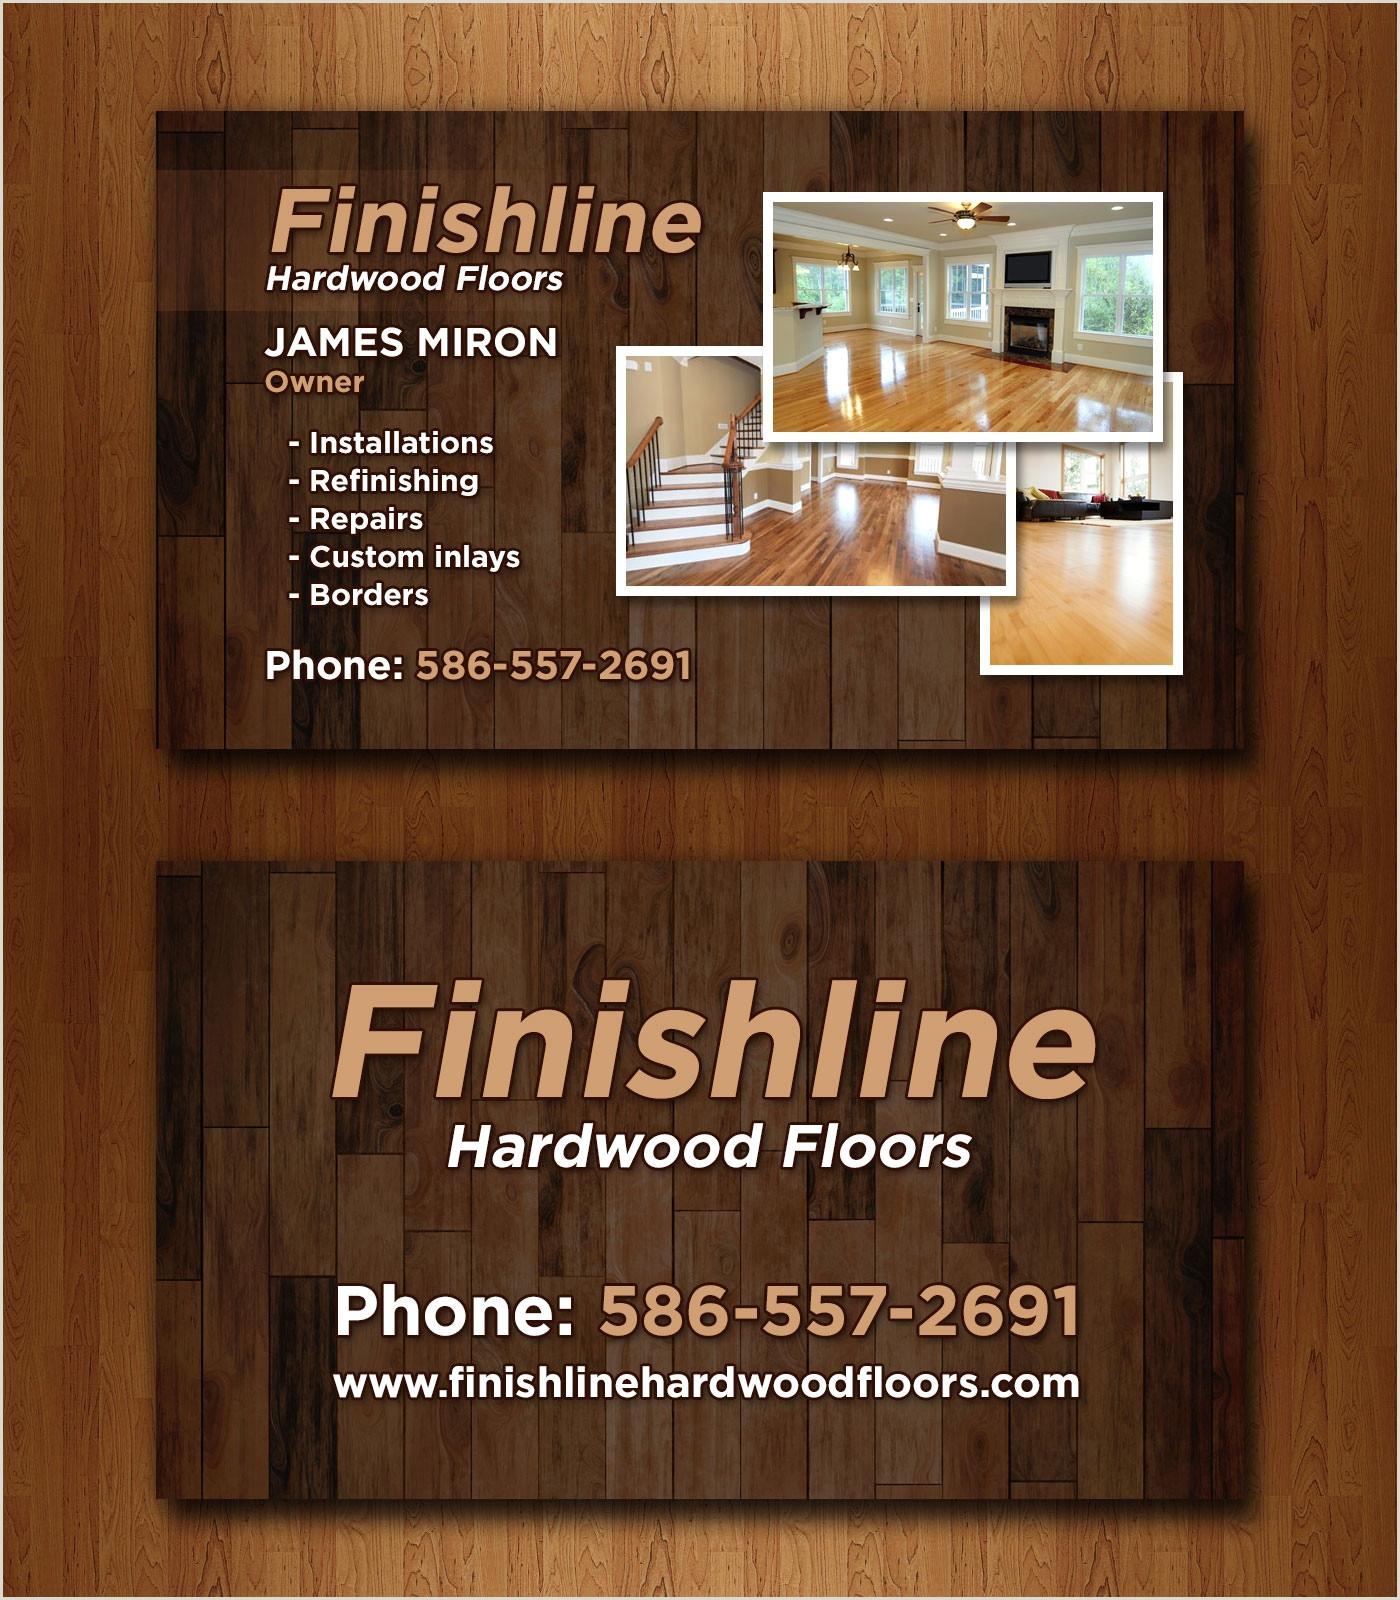 Best Business Cards Vistaprint Compare 14 Popular Hardwood Flooring Business Card Template